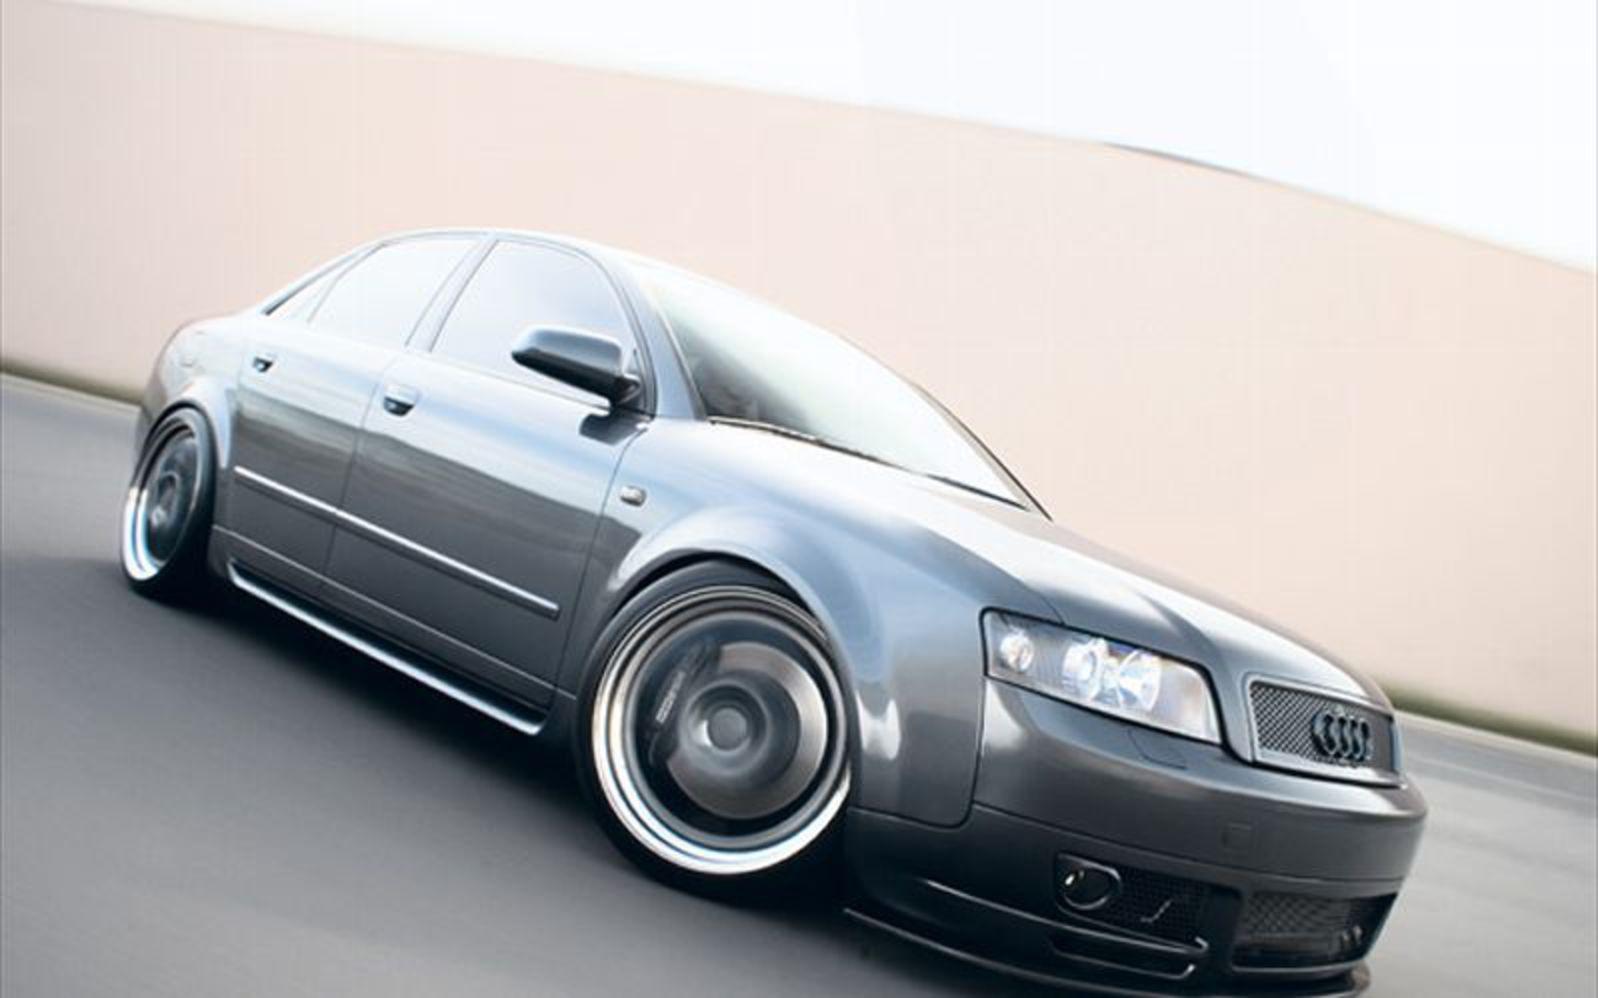 Audi A4 18t Quattro Audi A4 18 T Quattro Se Audi A4 18t